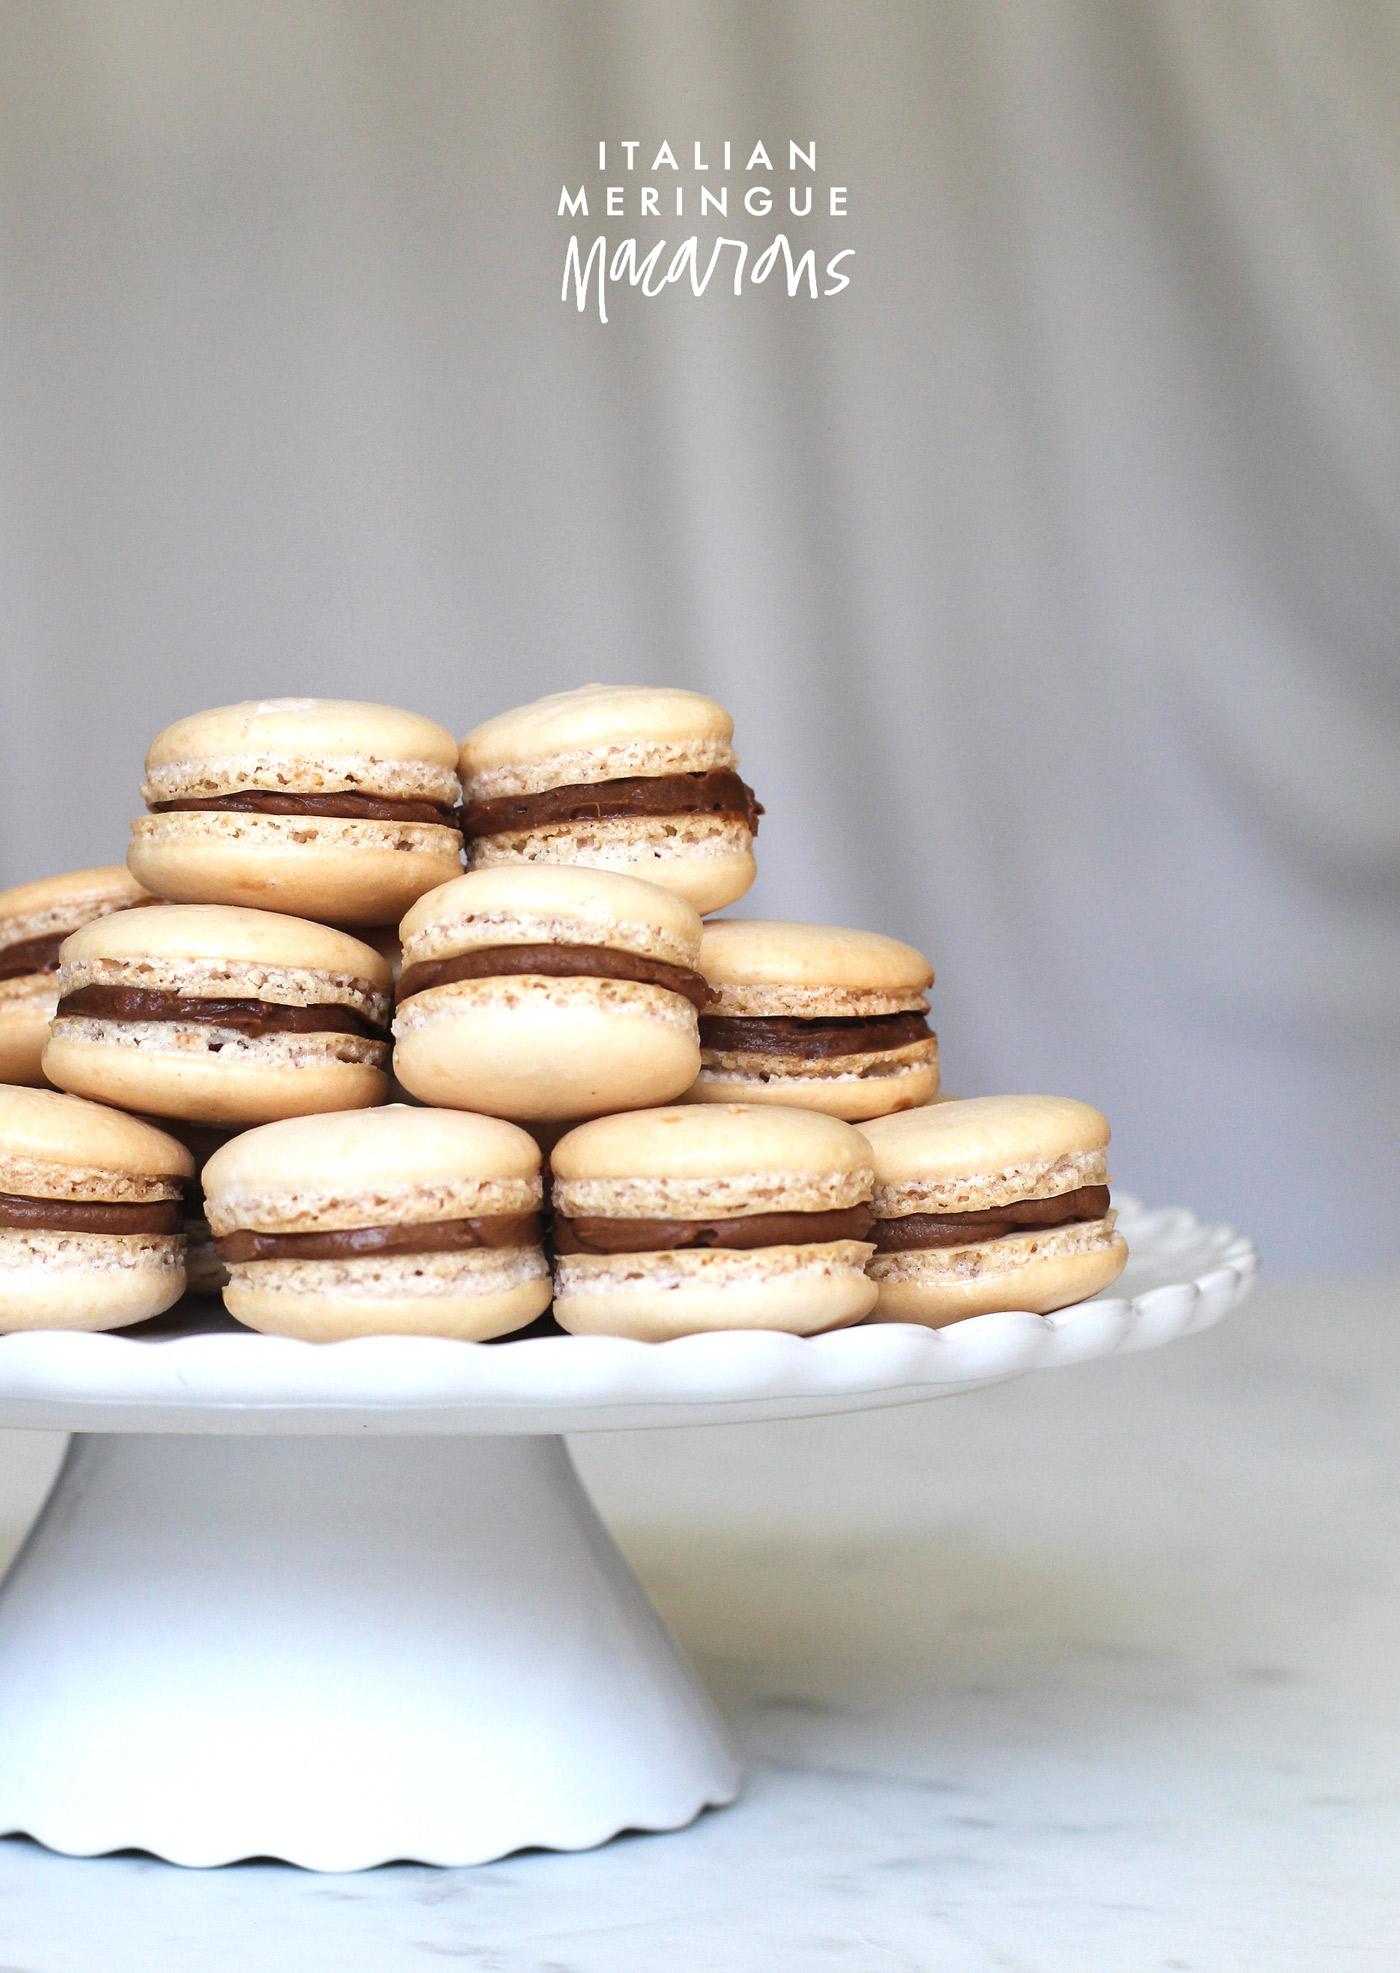 italian-meringue-macarons.jpg